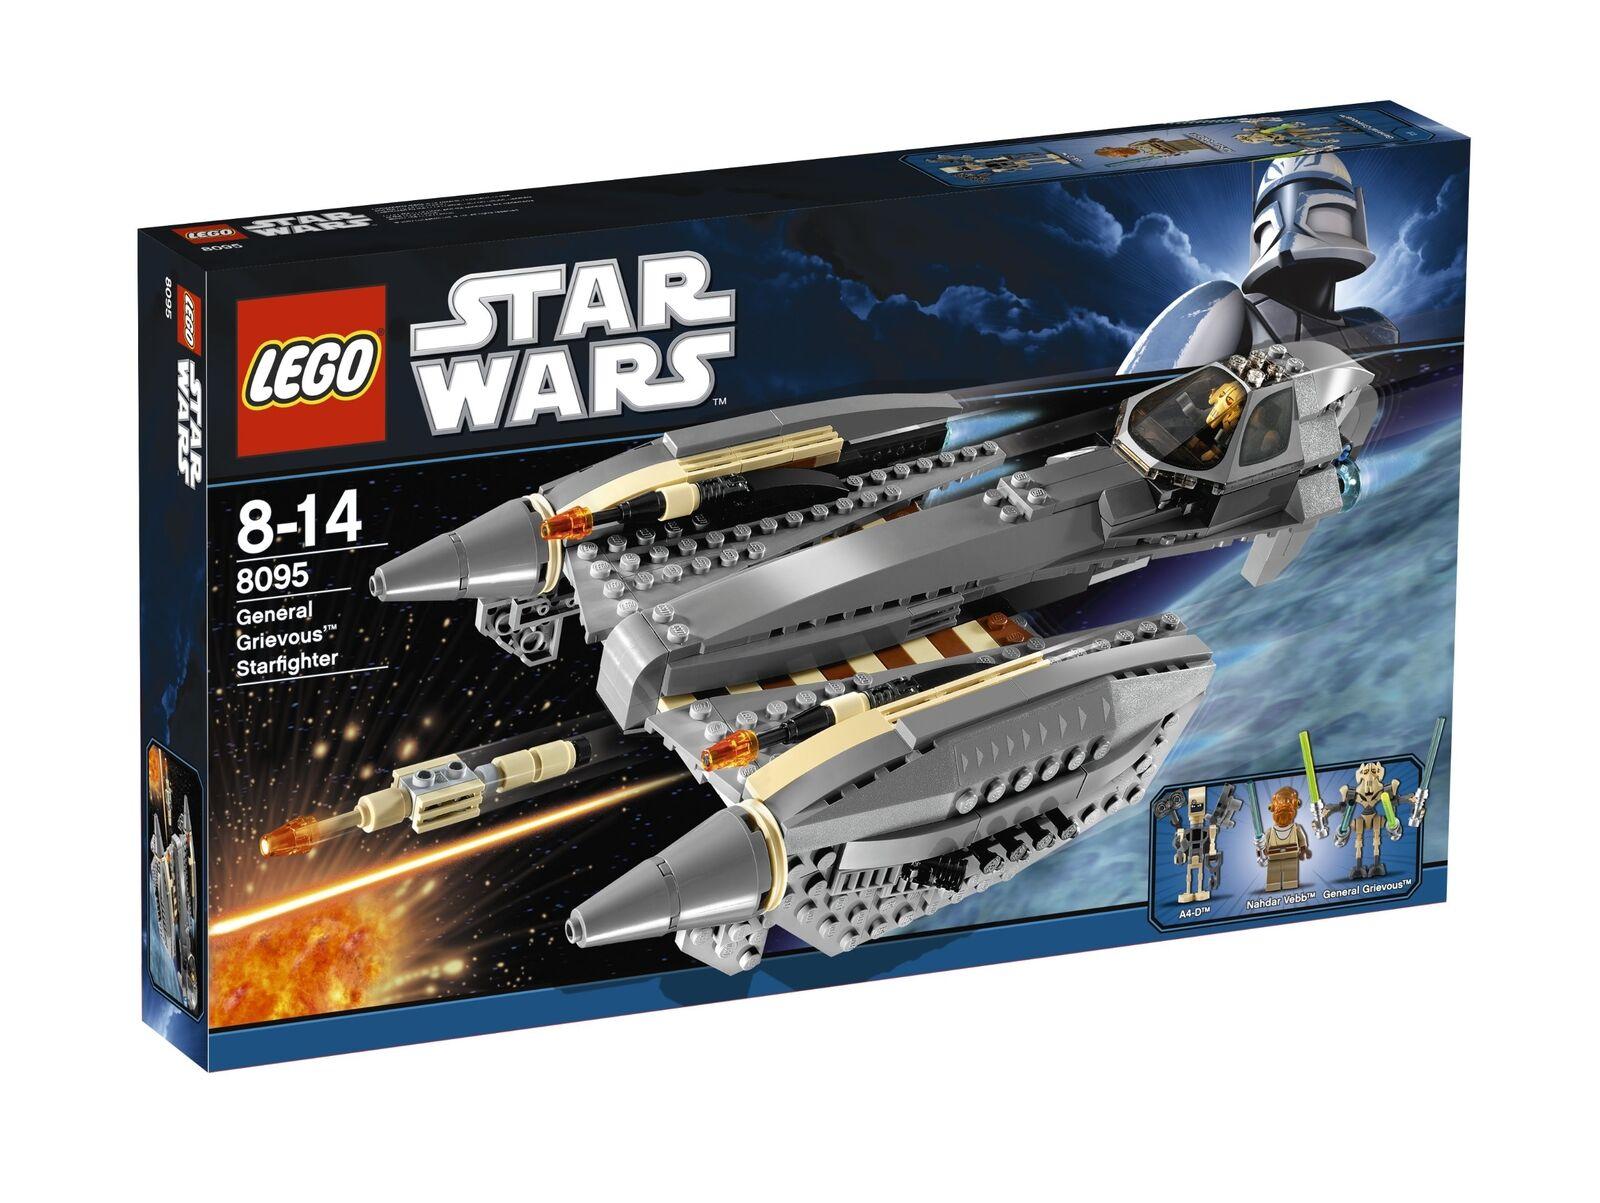 LEGO Star Wars Wars Wars 8095 - General Grievous - Starfighter  I3E  a8c8c3